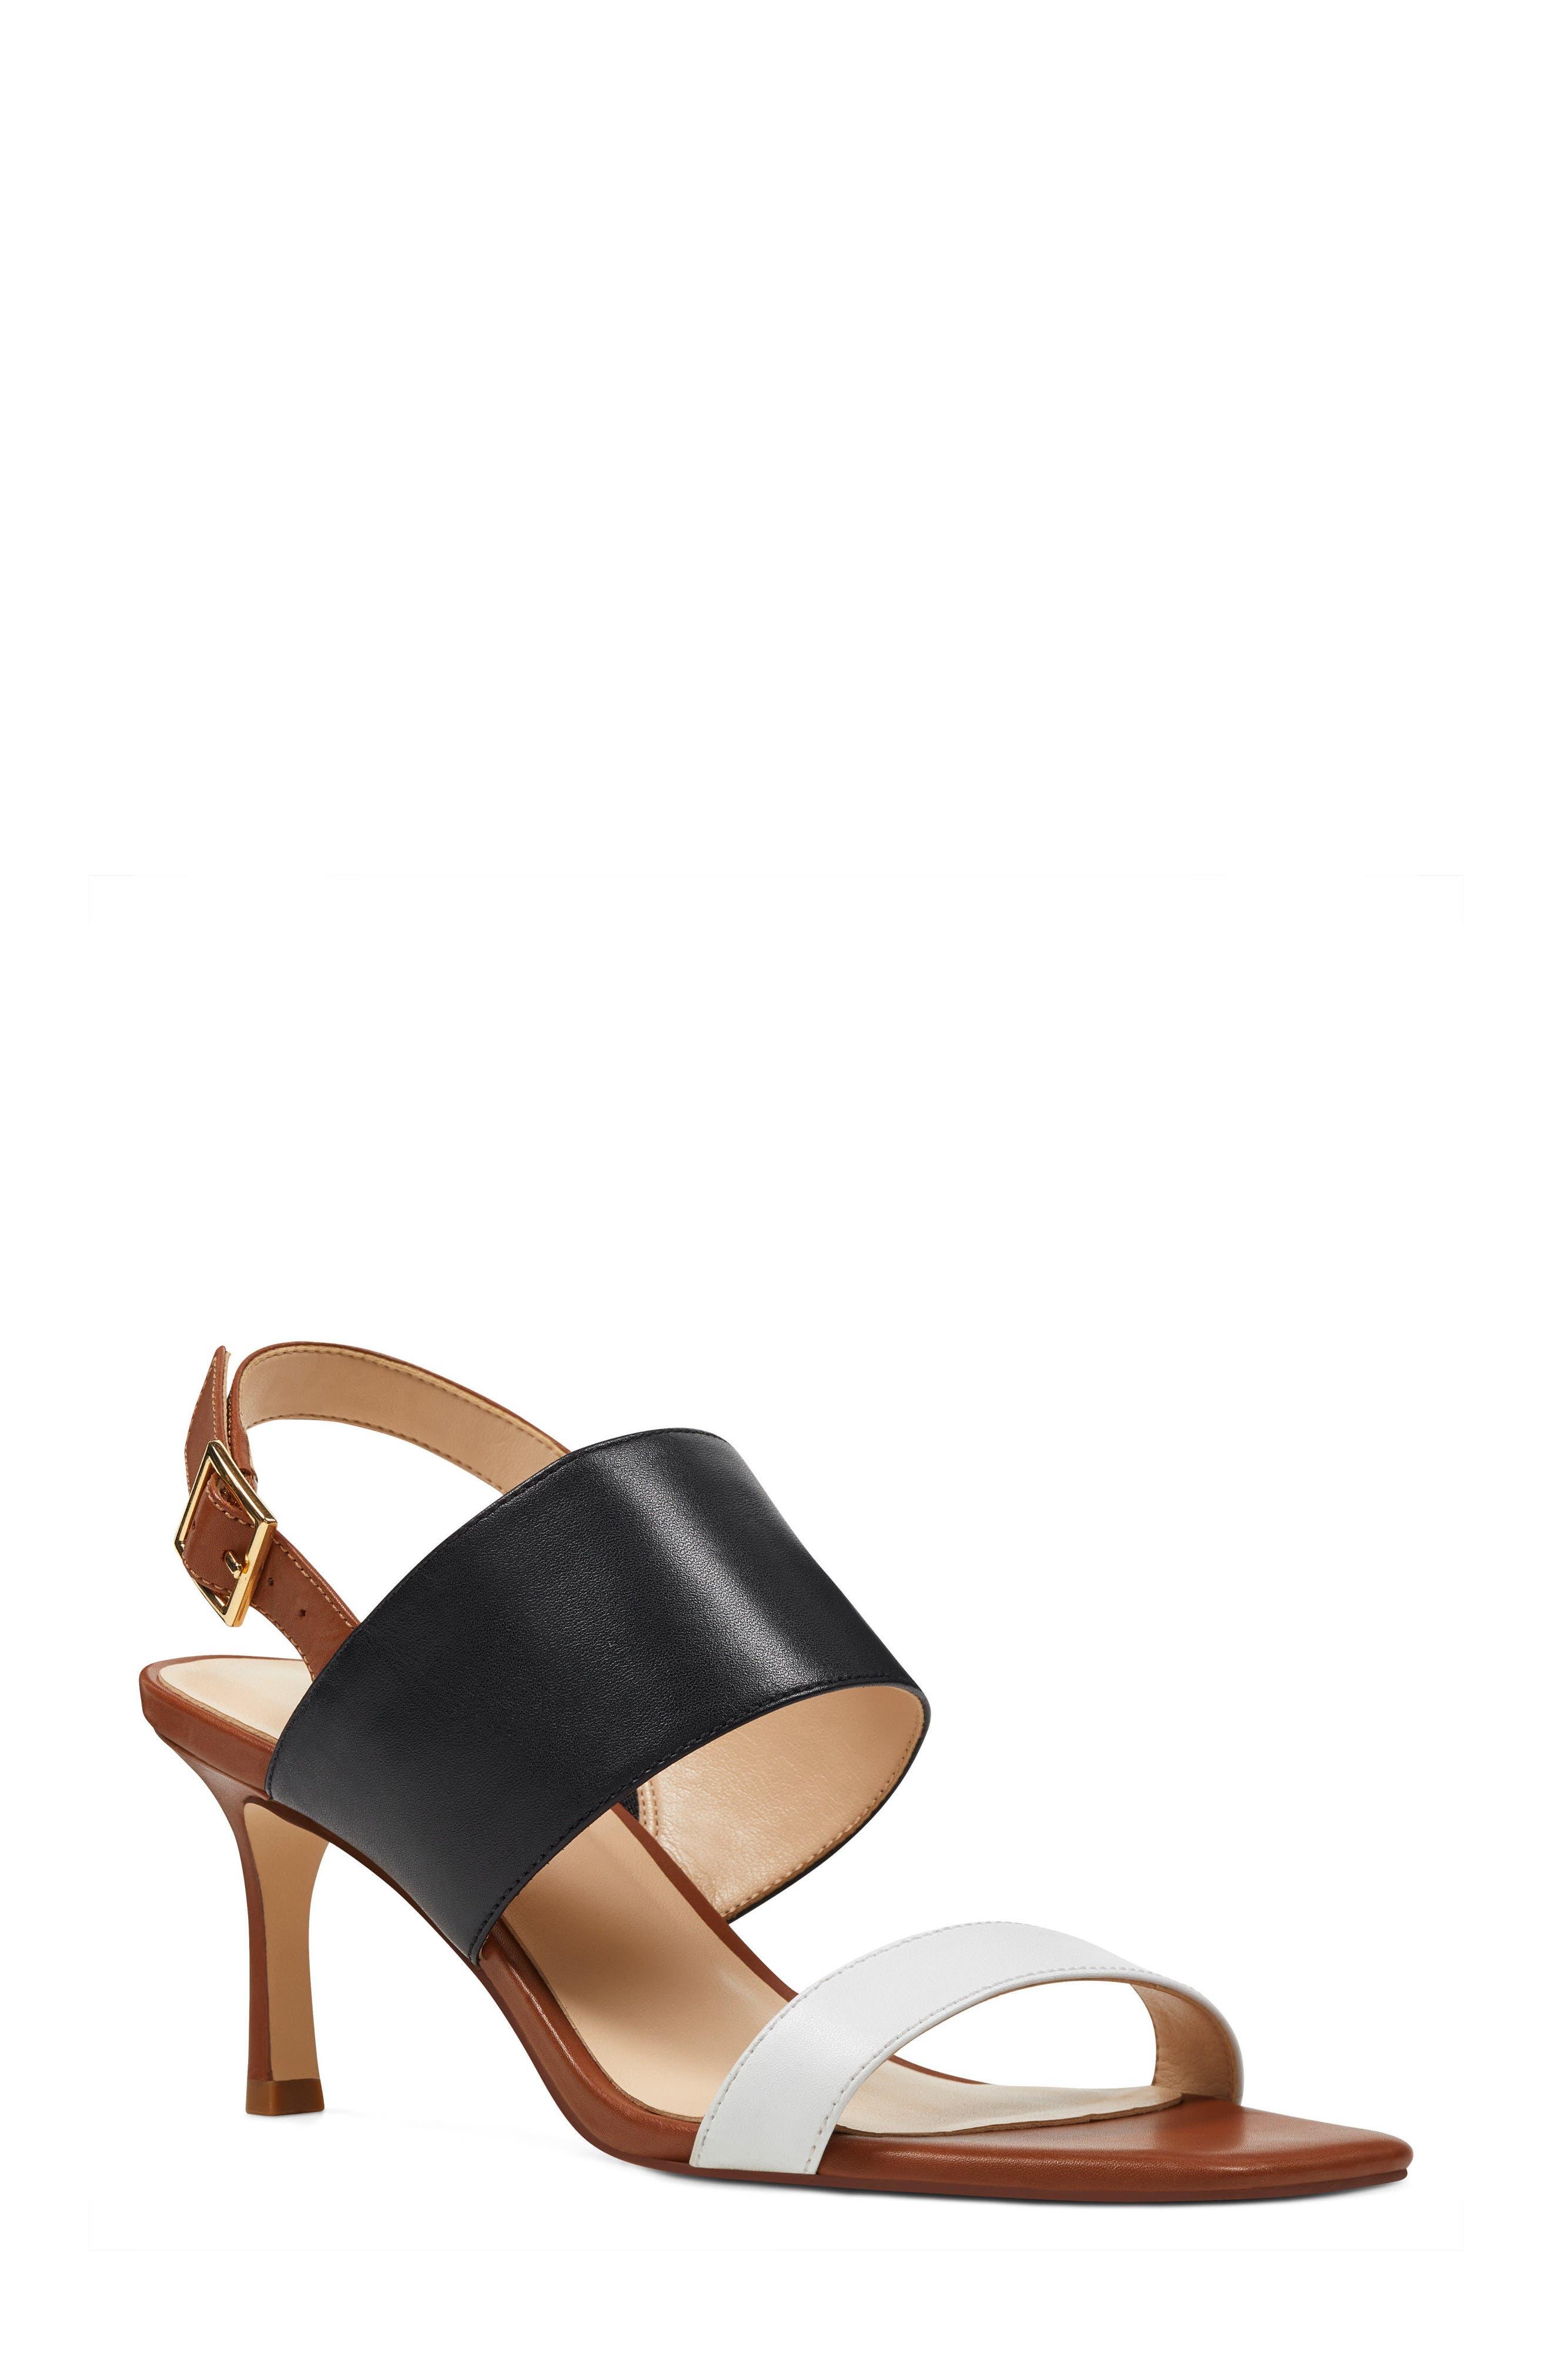 Main Image - Nine West Orilla Slingback Sandal (Women)